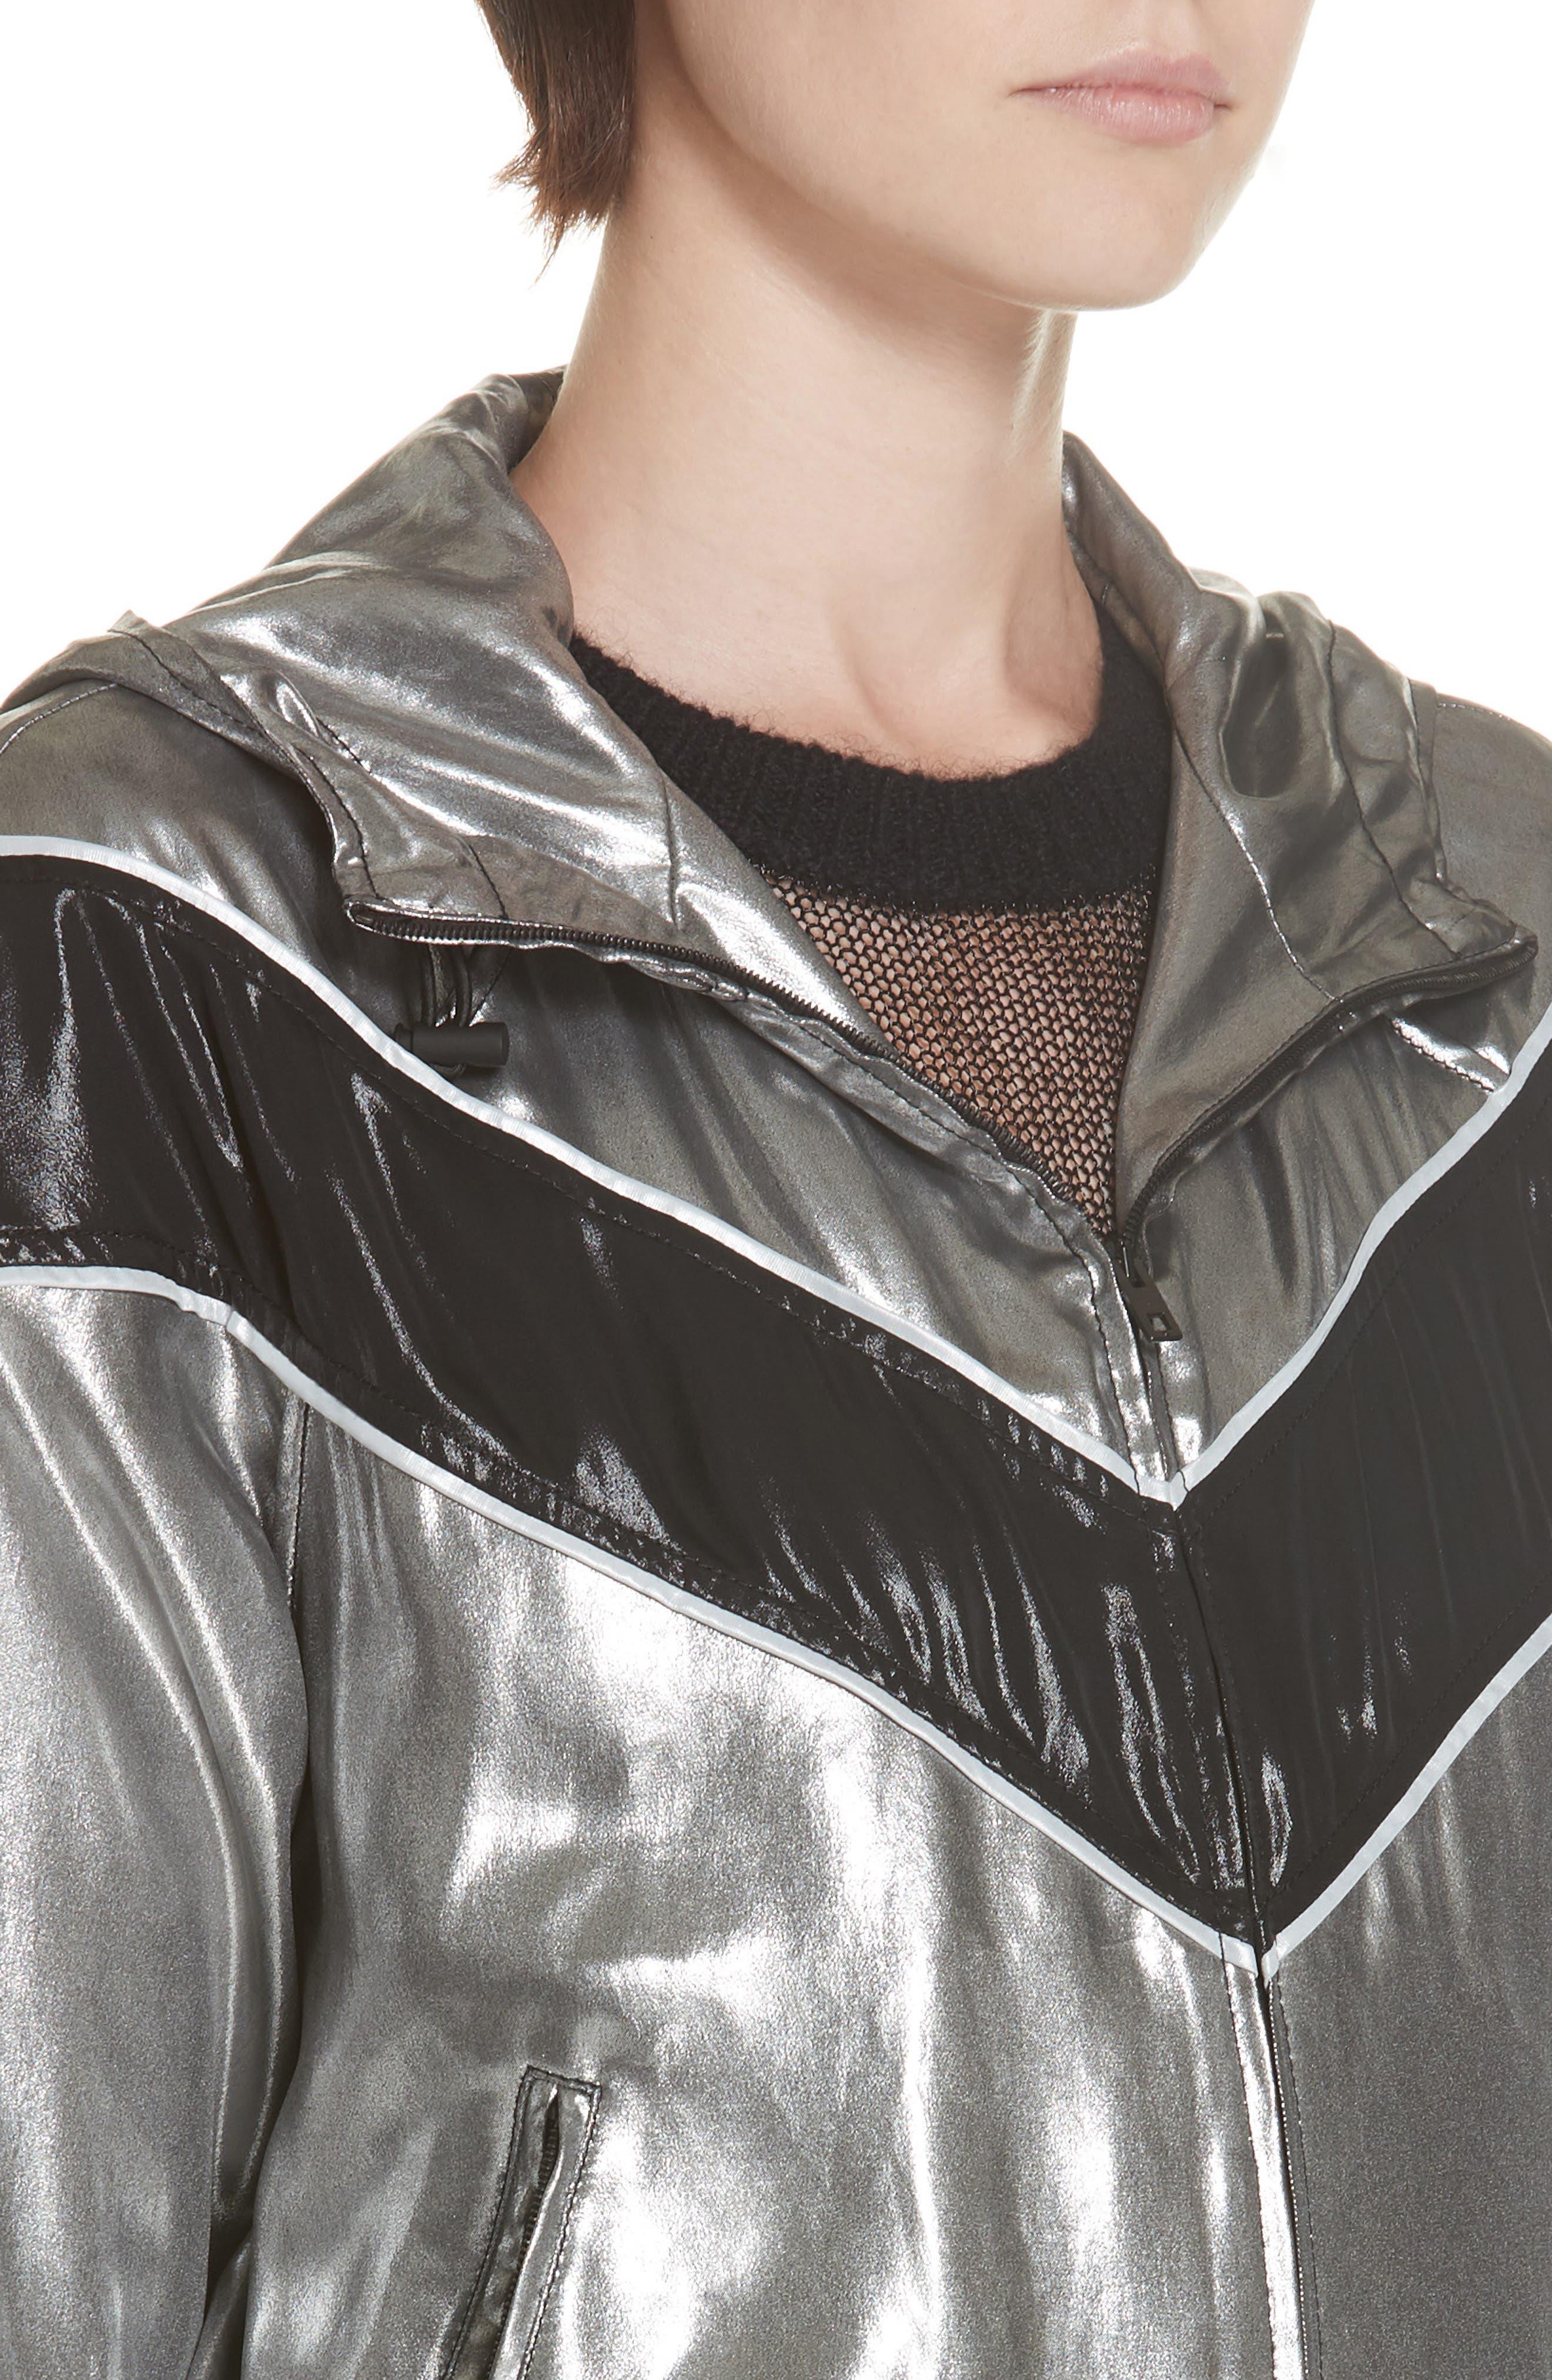 RAG & BONE,                             Sloane Metallic Track Jacket,                             Alternate thumbnail 5, color,                             SILVER/ BLACK